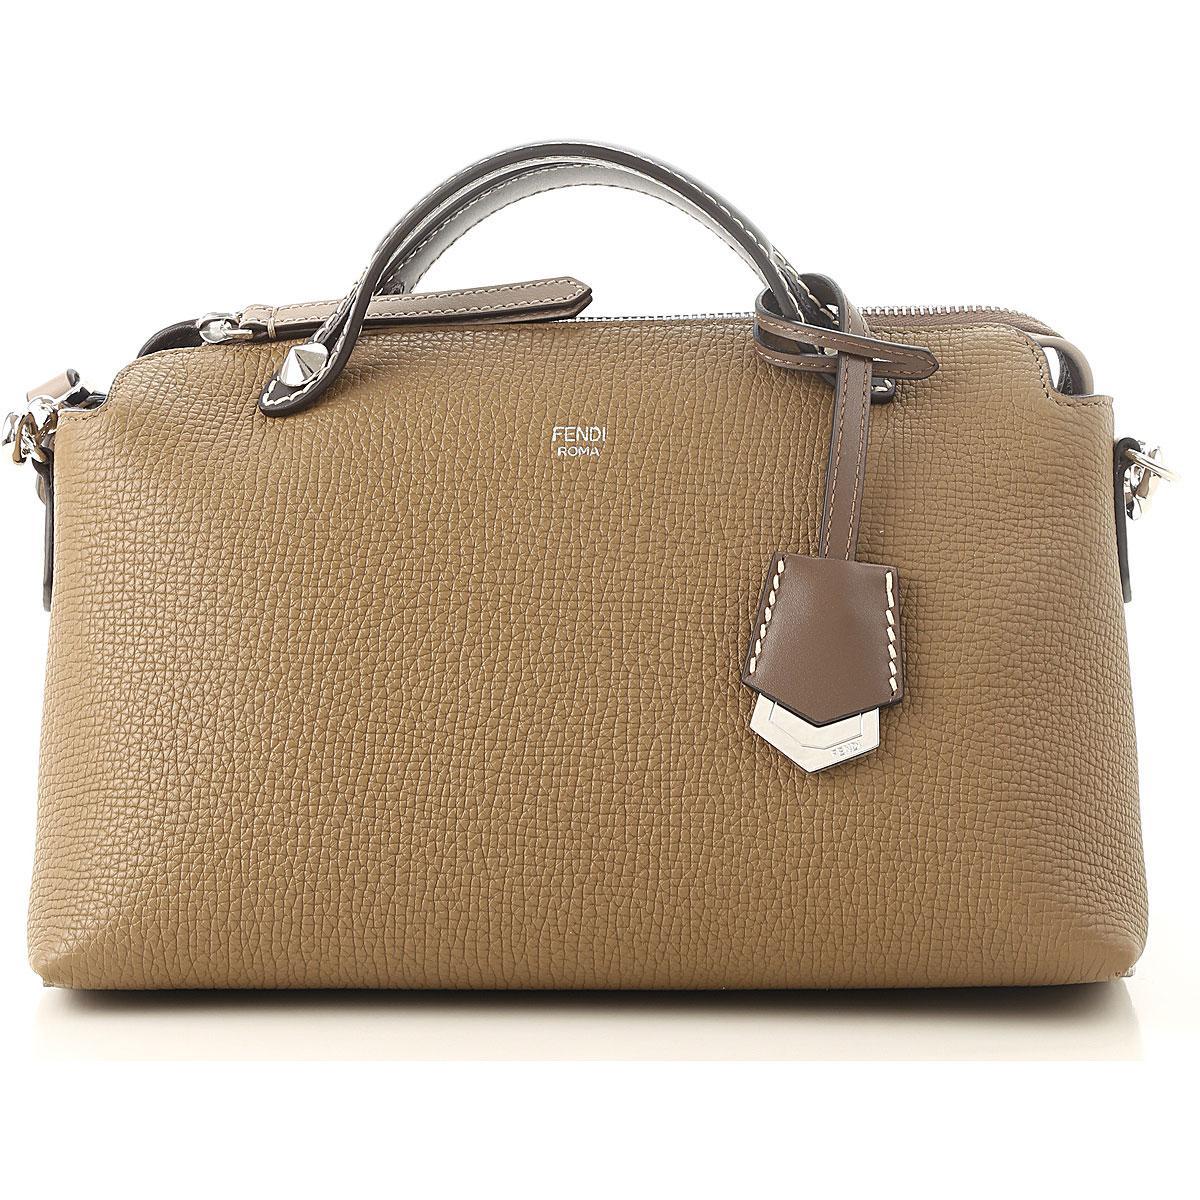 91ac974b8358 Fendi. Women s Top Handle Handbag